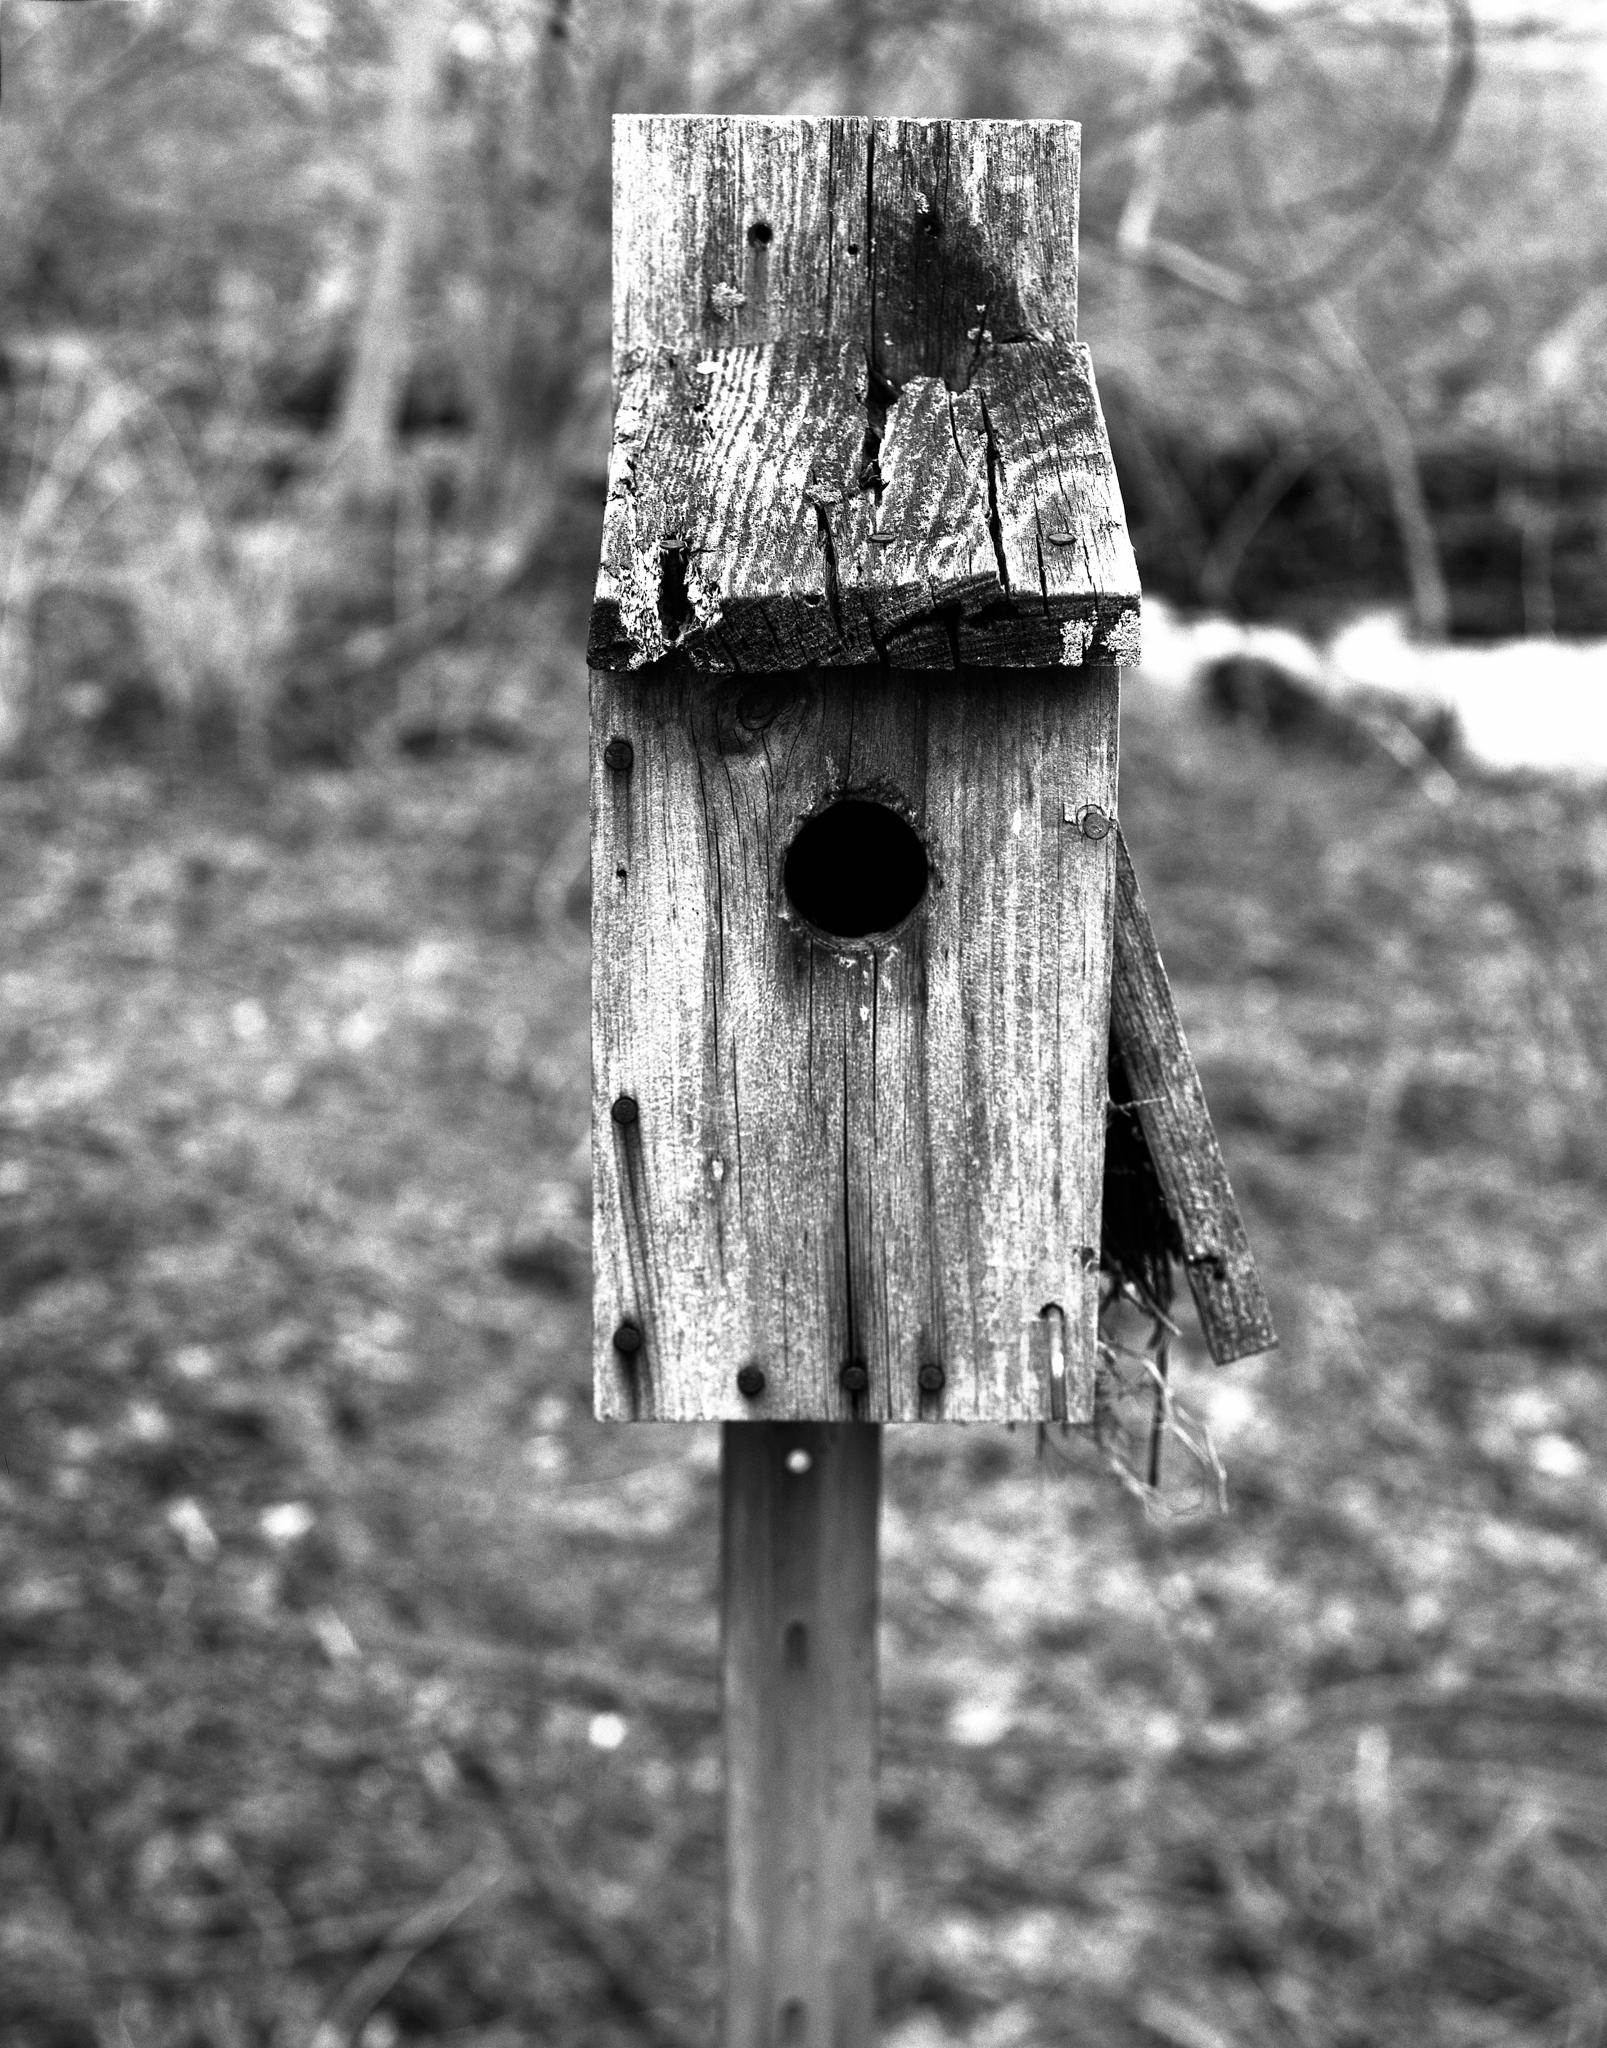 4x5_for_365_project_082_Birdhouse.jpg